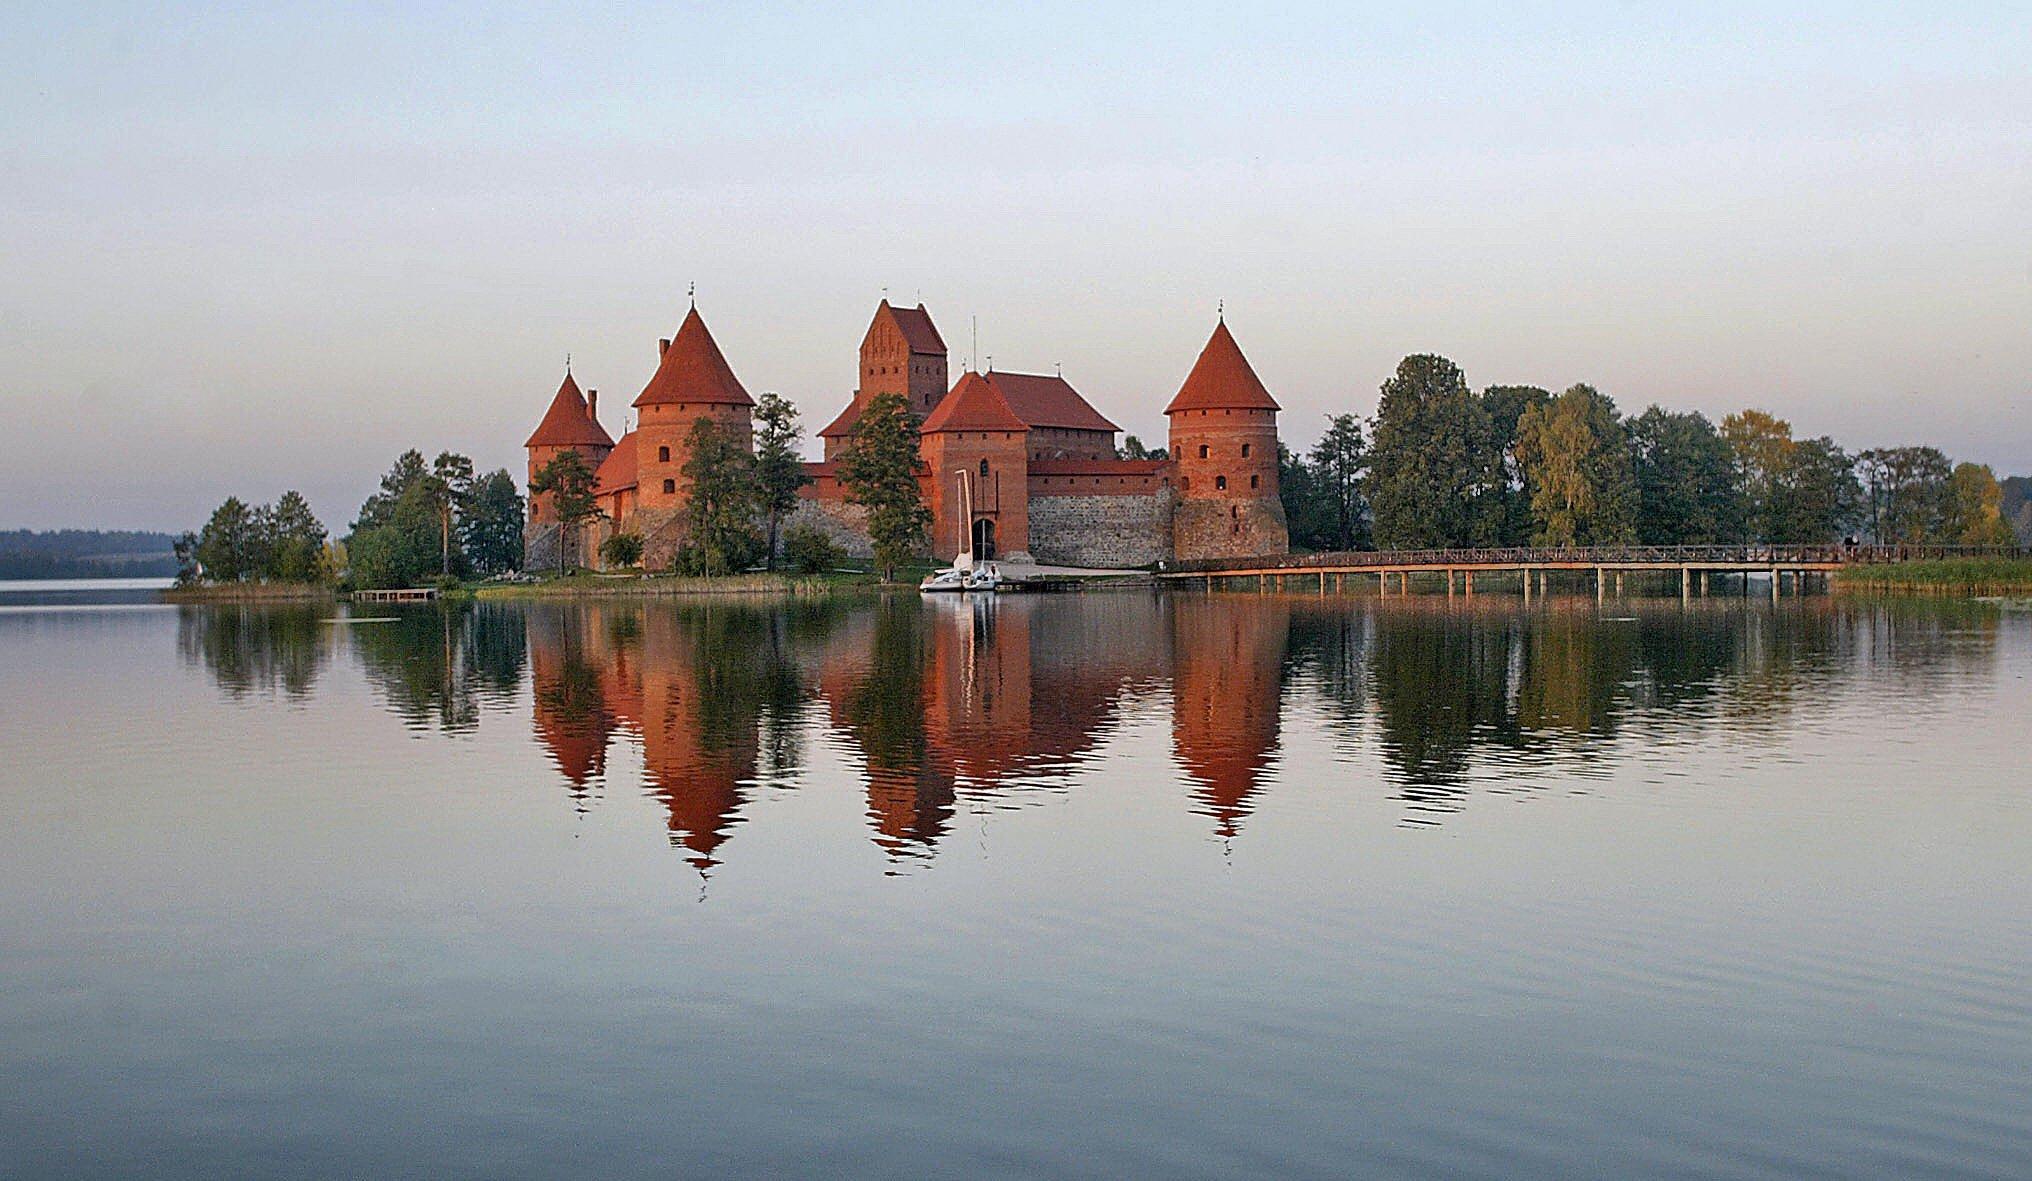 位於立陶宛Galvė湖島上的特拉凱城堡。(PETRAS MALUKAS/AFP/Getty Images)